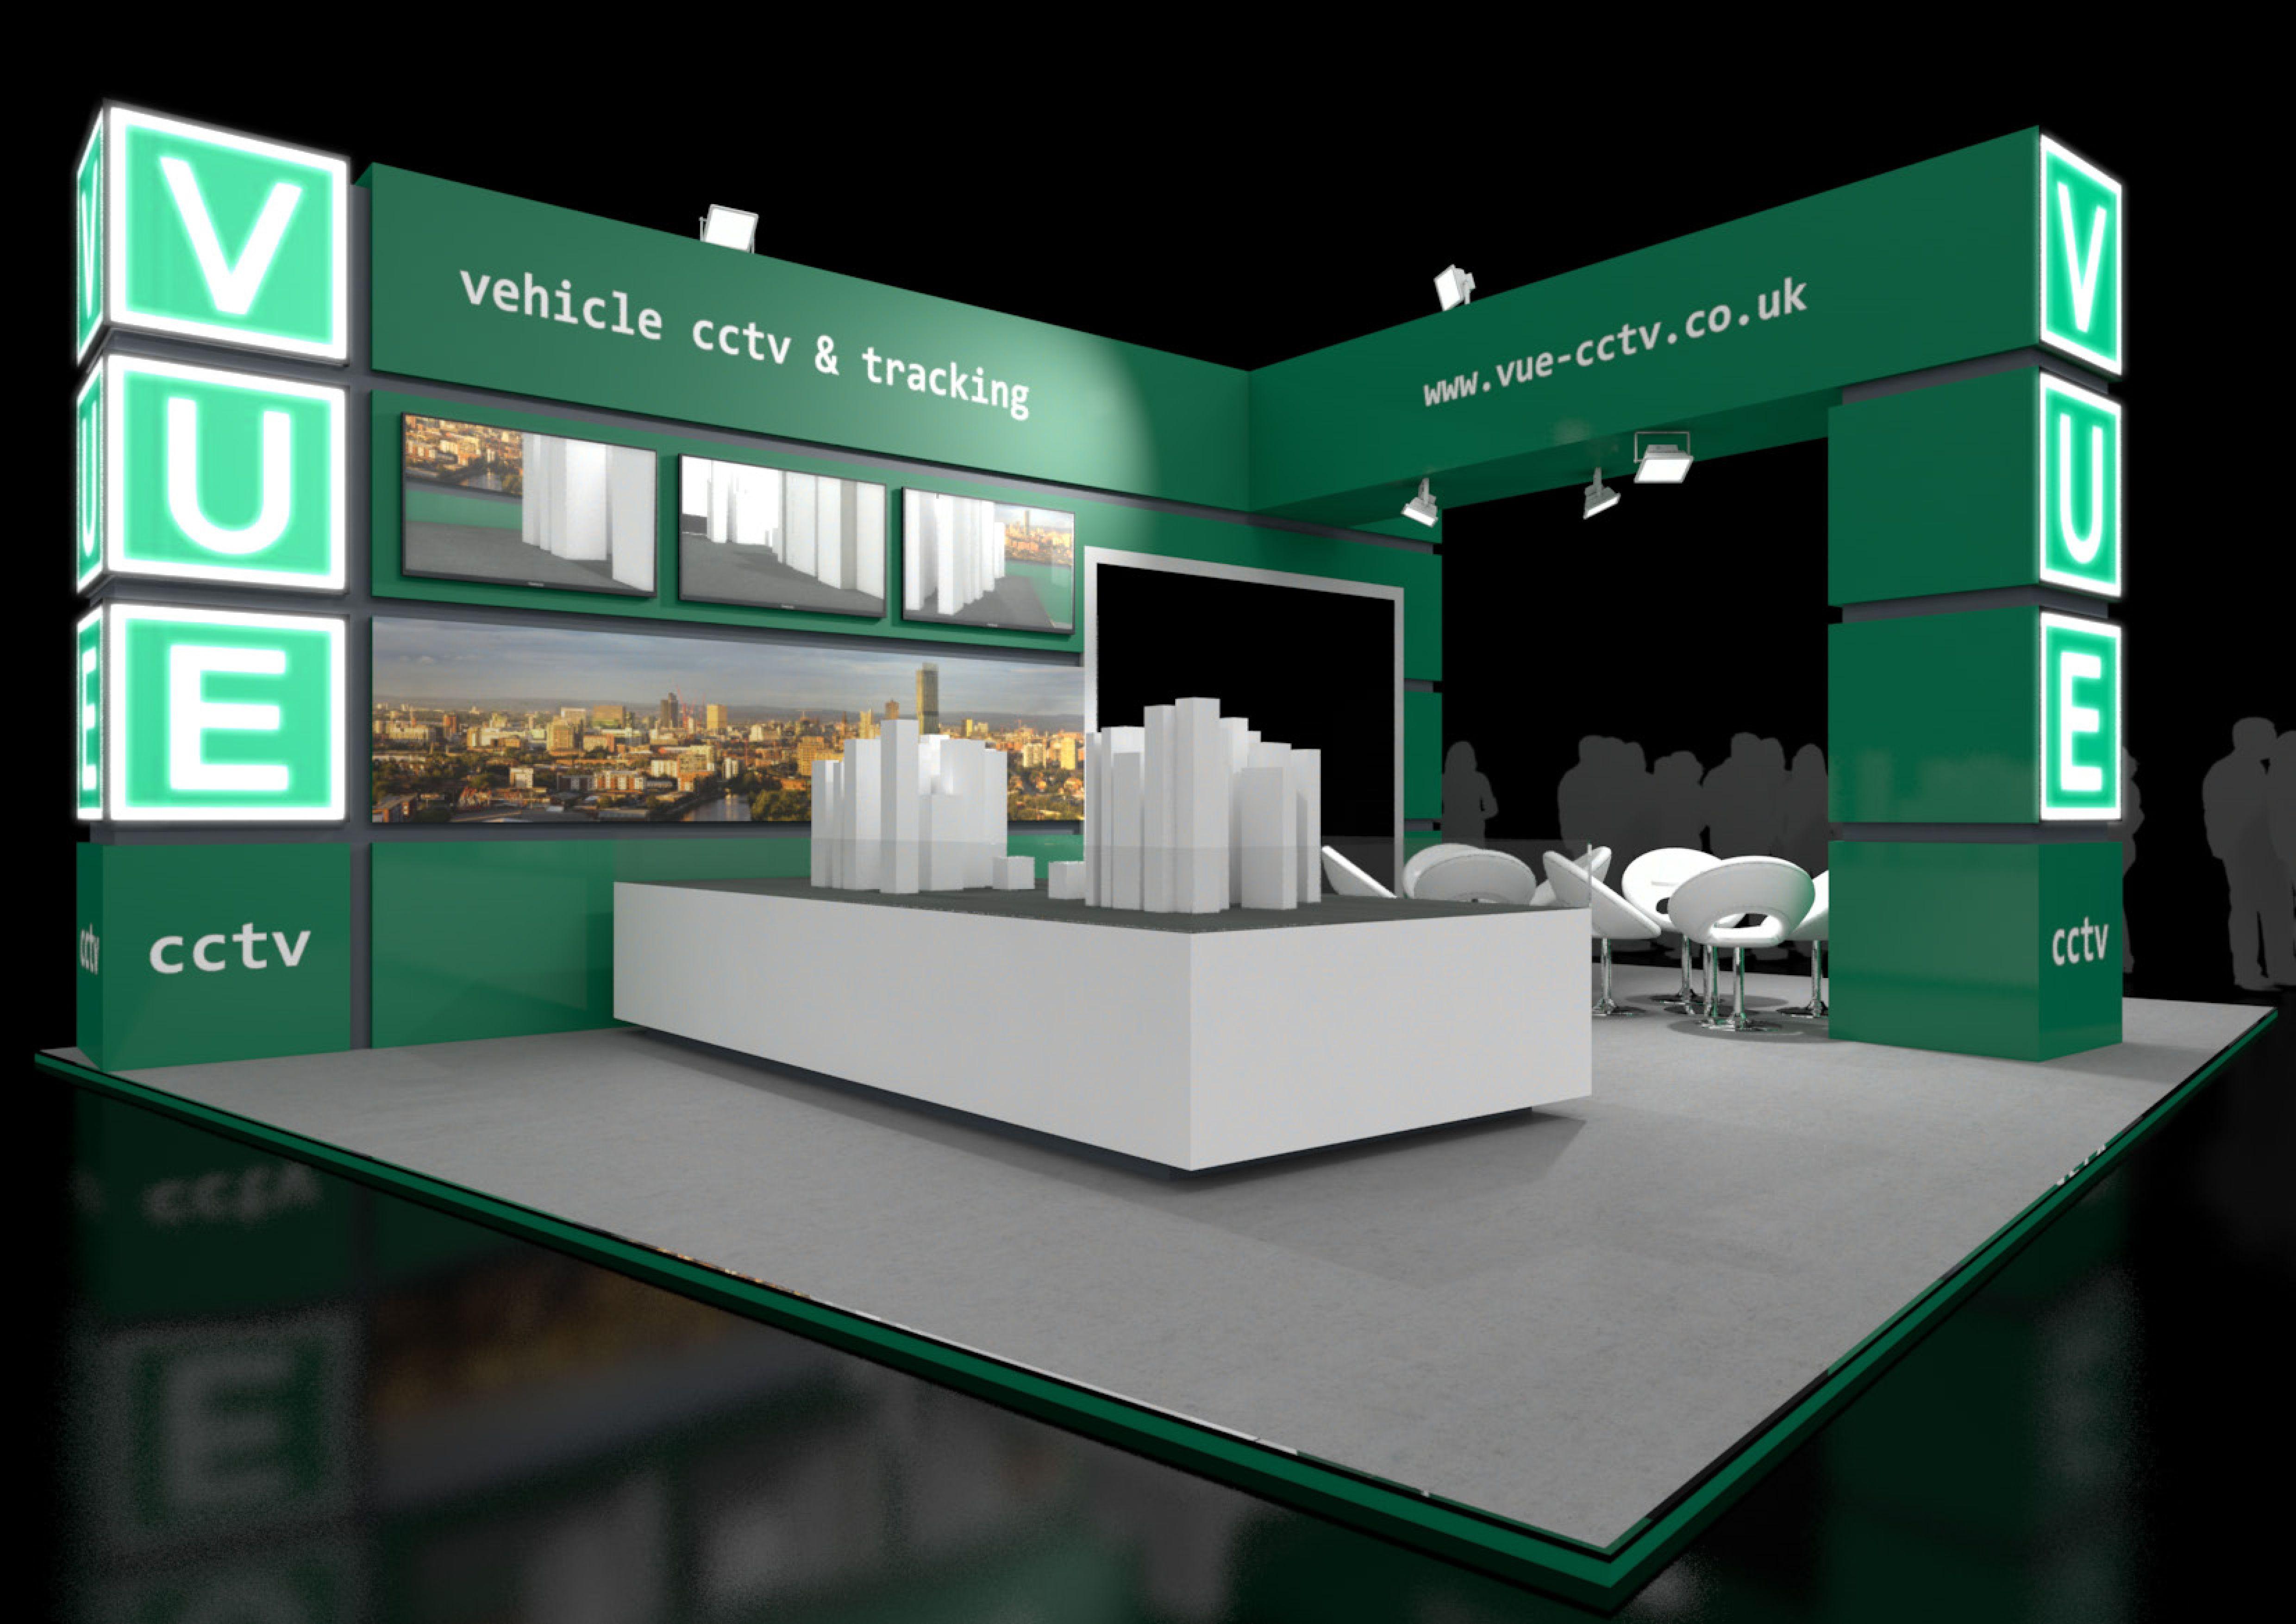 Exhibition Stand Design Birmingham : Exhibition stand design created for vue cctv